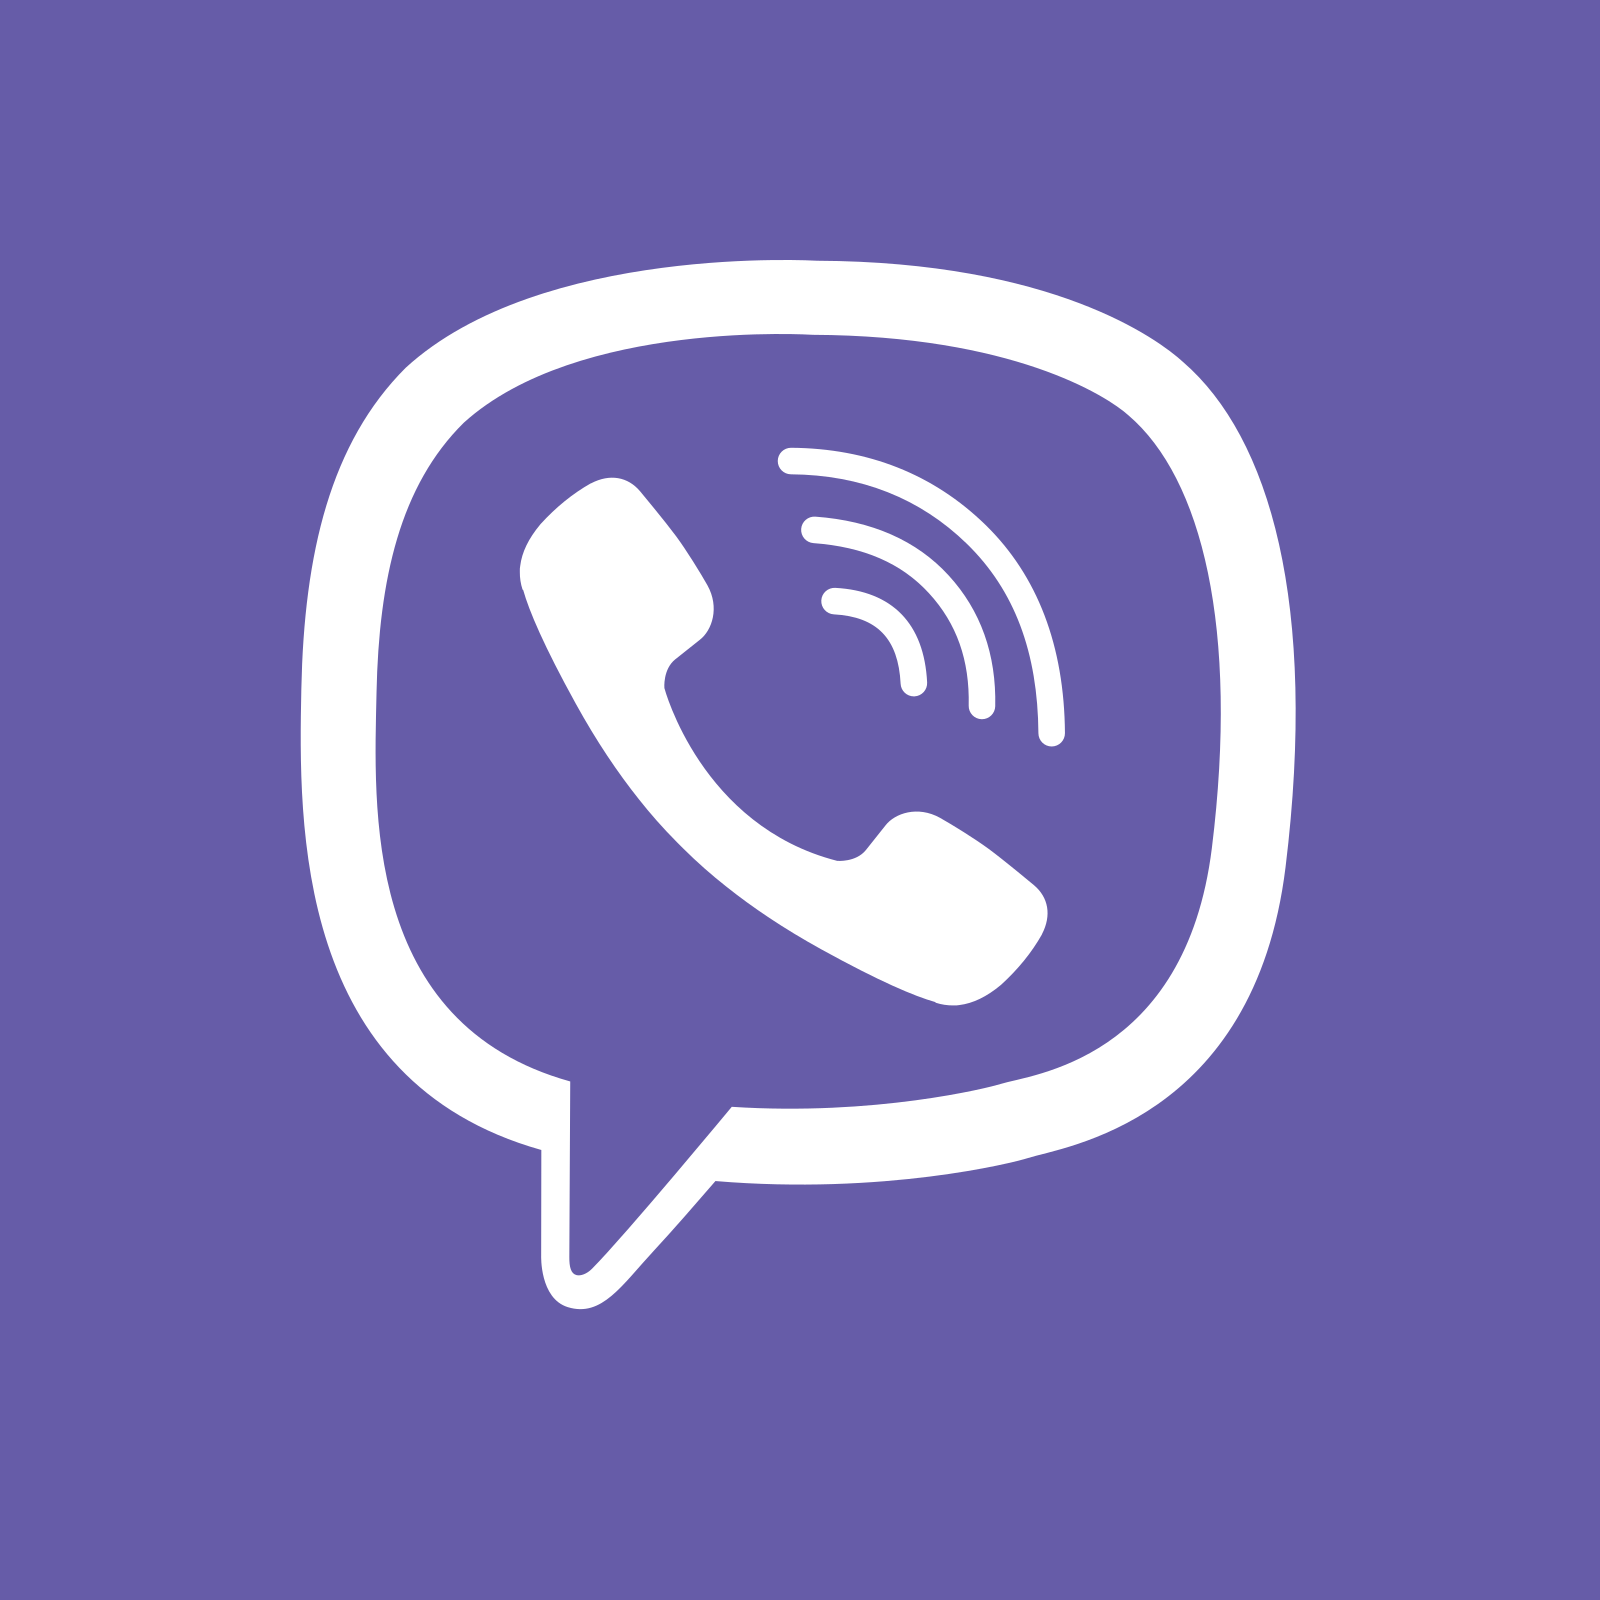 viber logo icon 6 - Rakuten Viber Logo - Icon